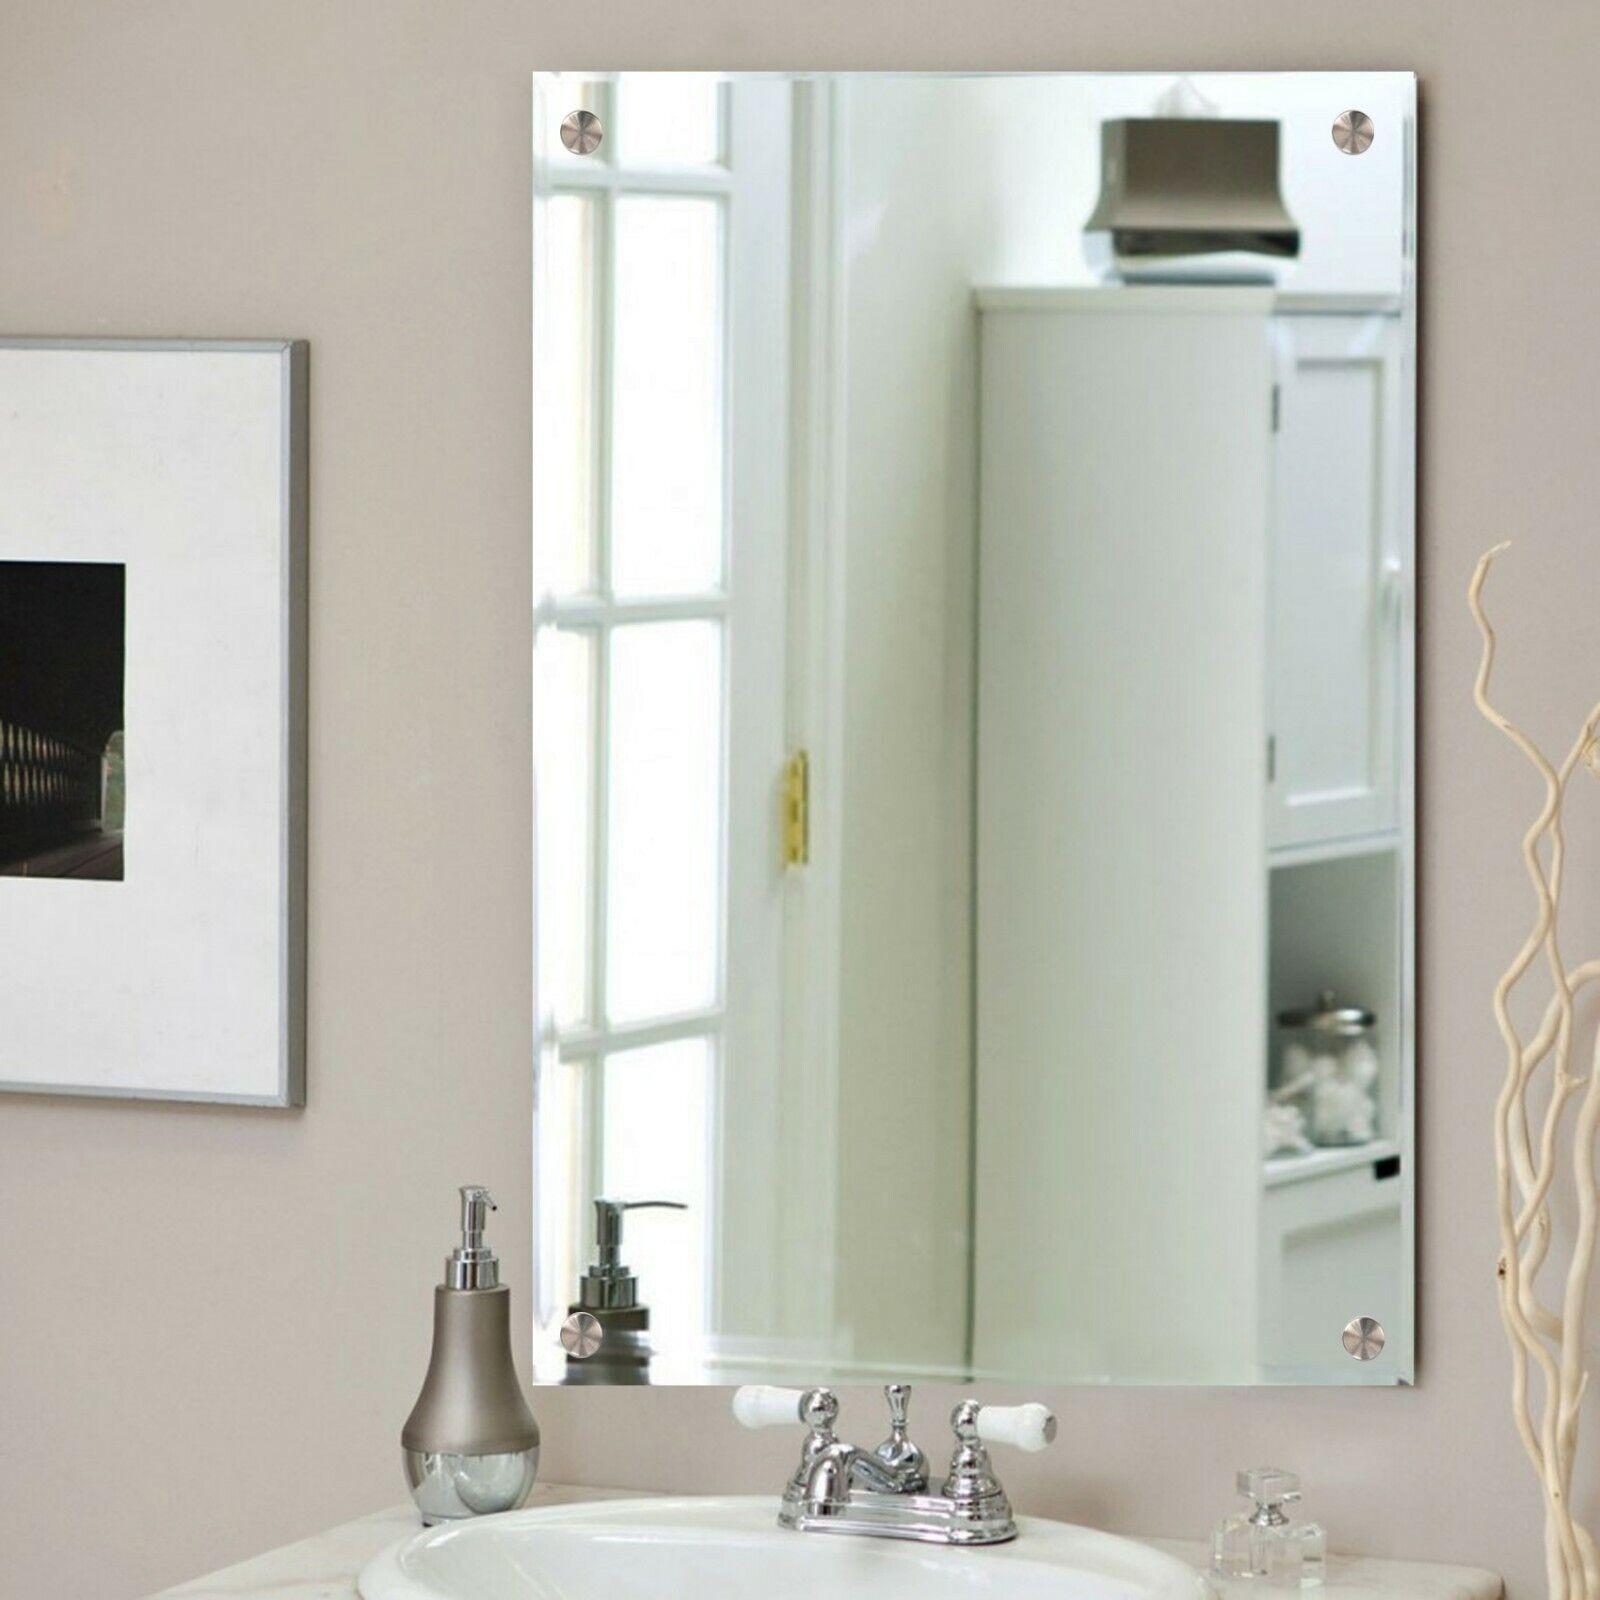 Wall Hanging Frameless Bathroom Mirror